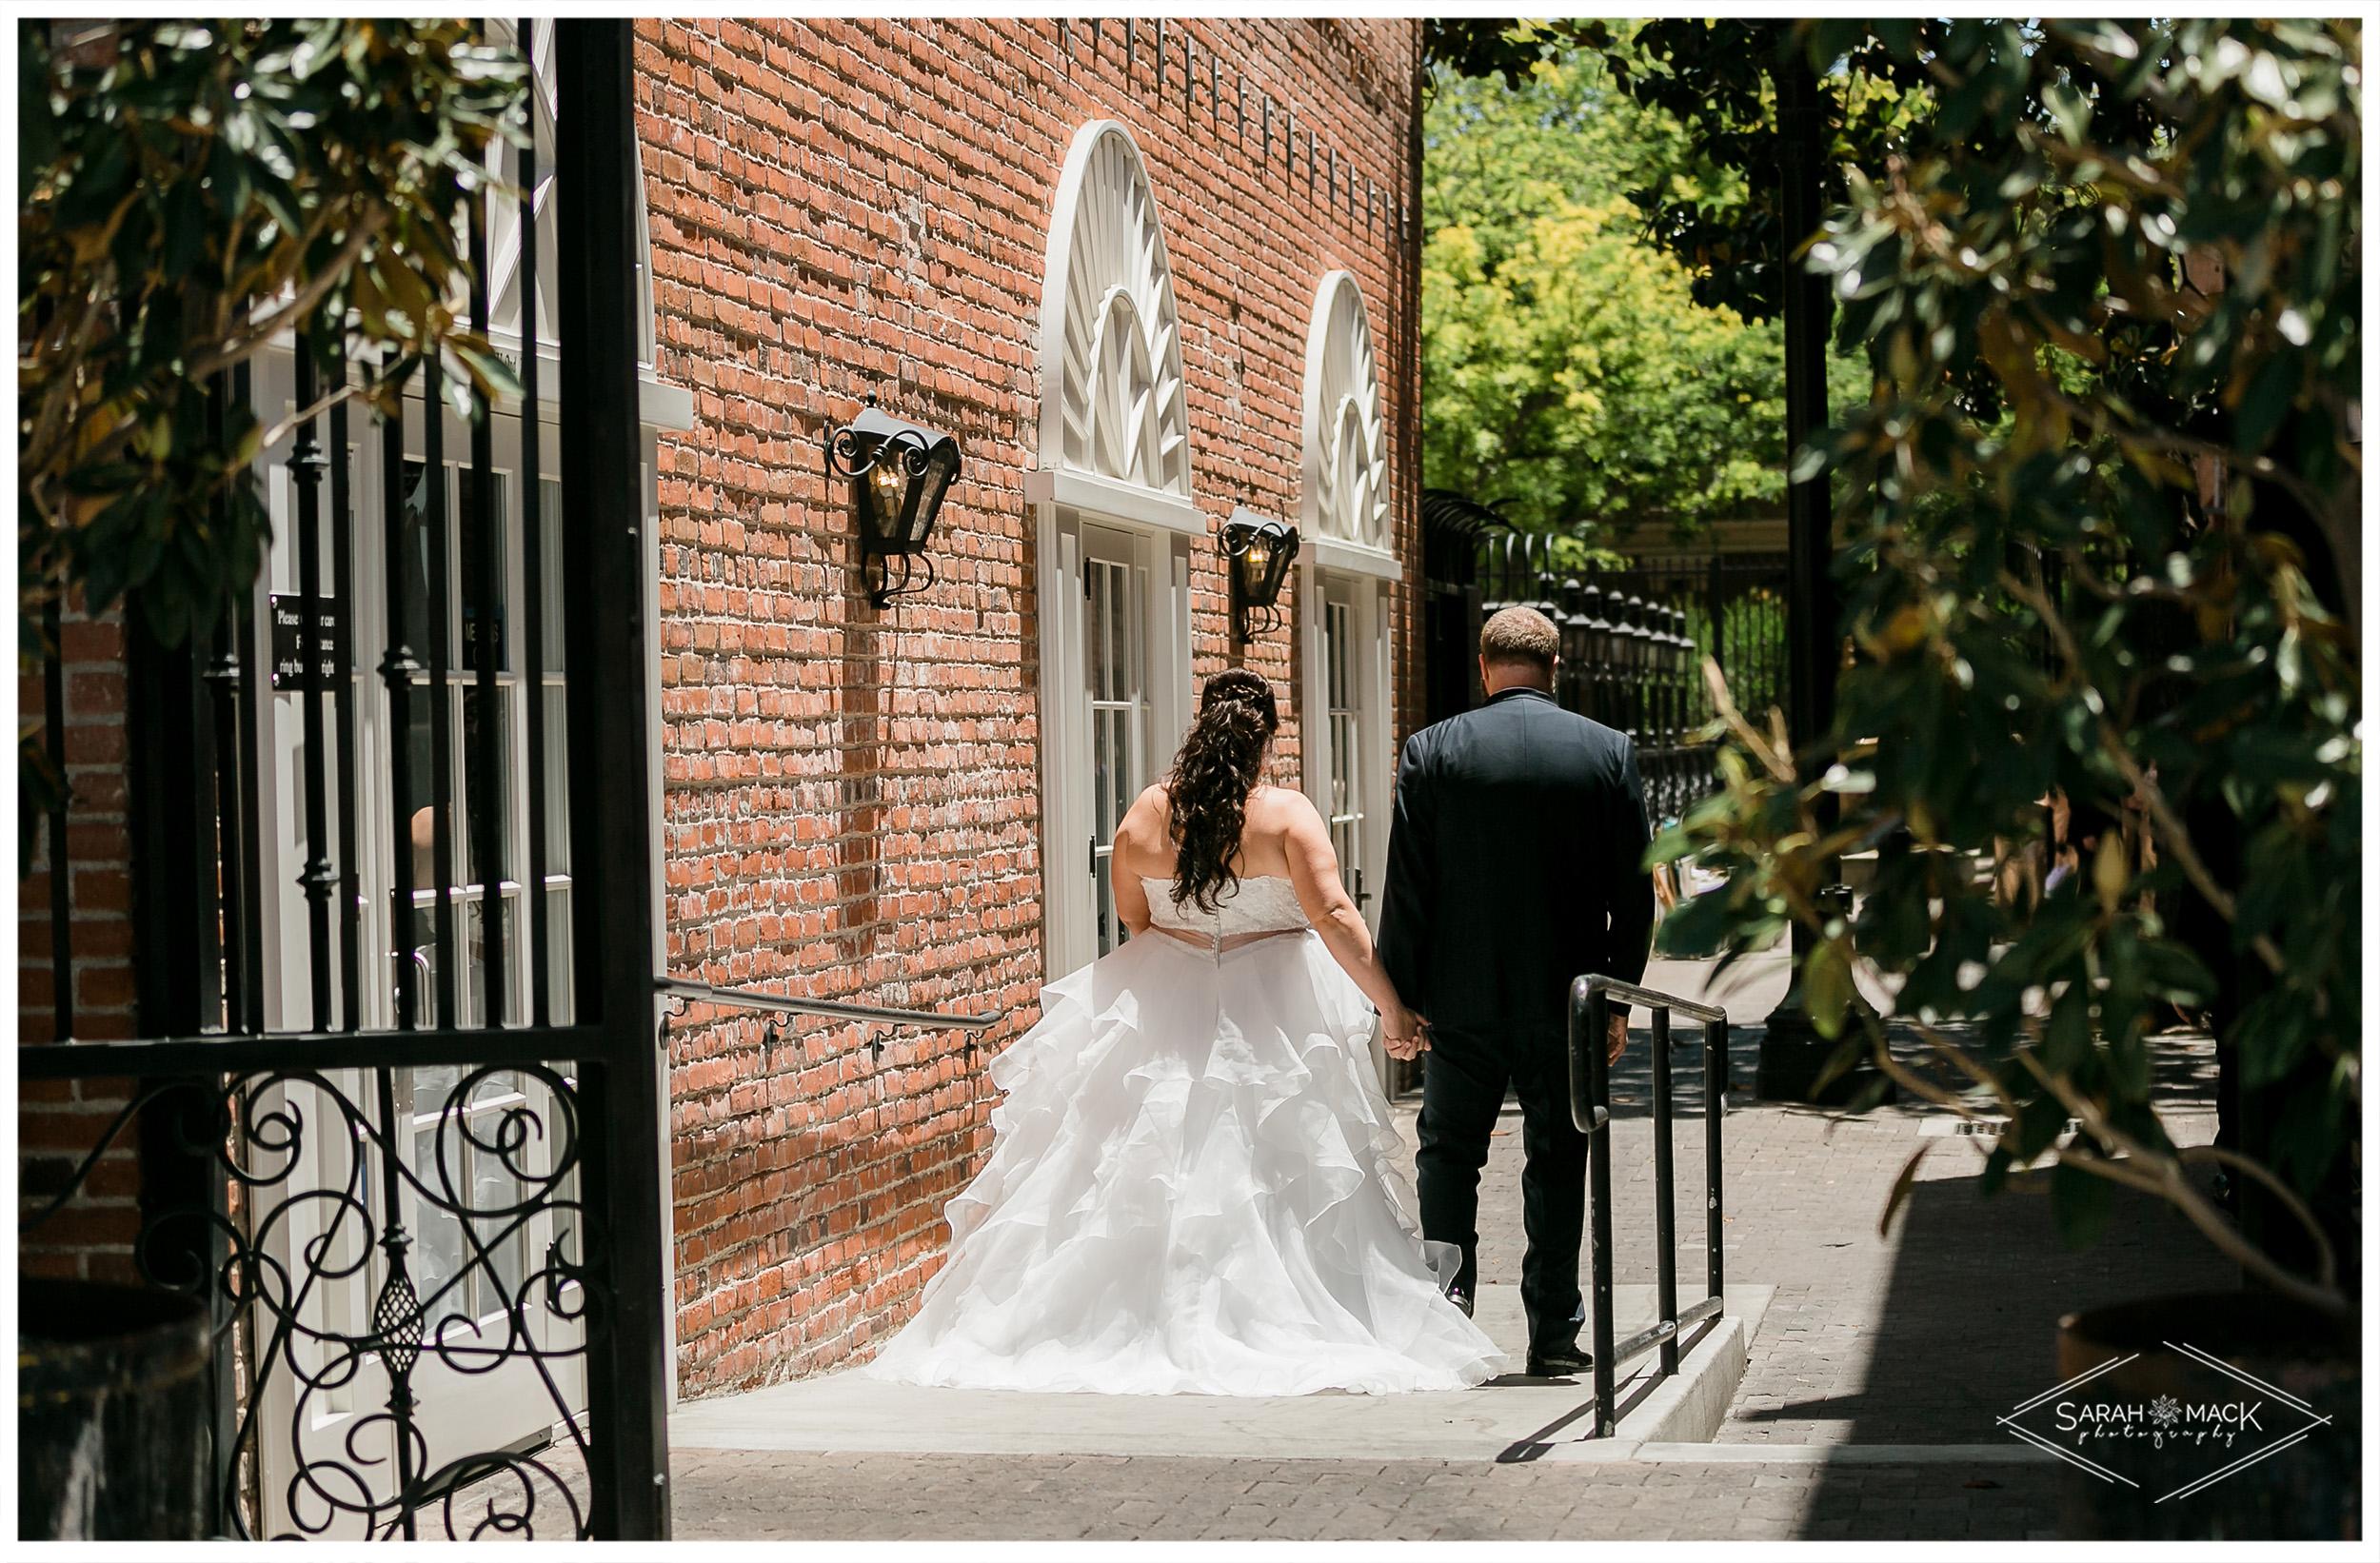 RF-Estate-on-Second-Santa-Ana-Wedding-Photography-18.jpg